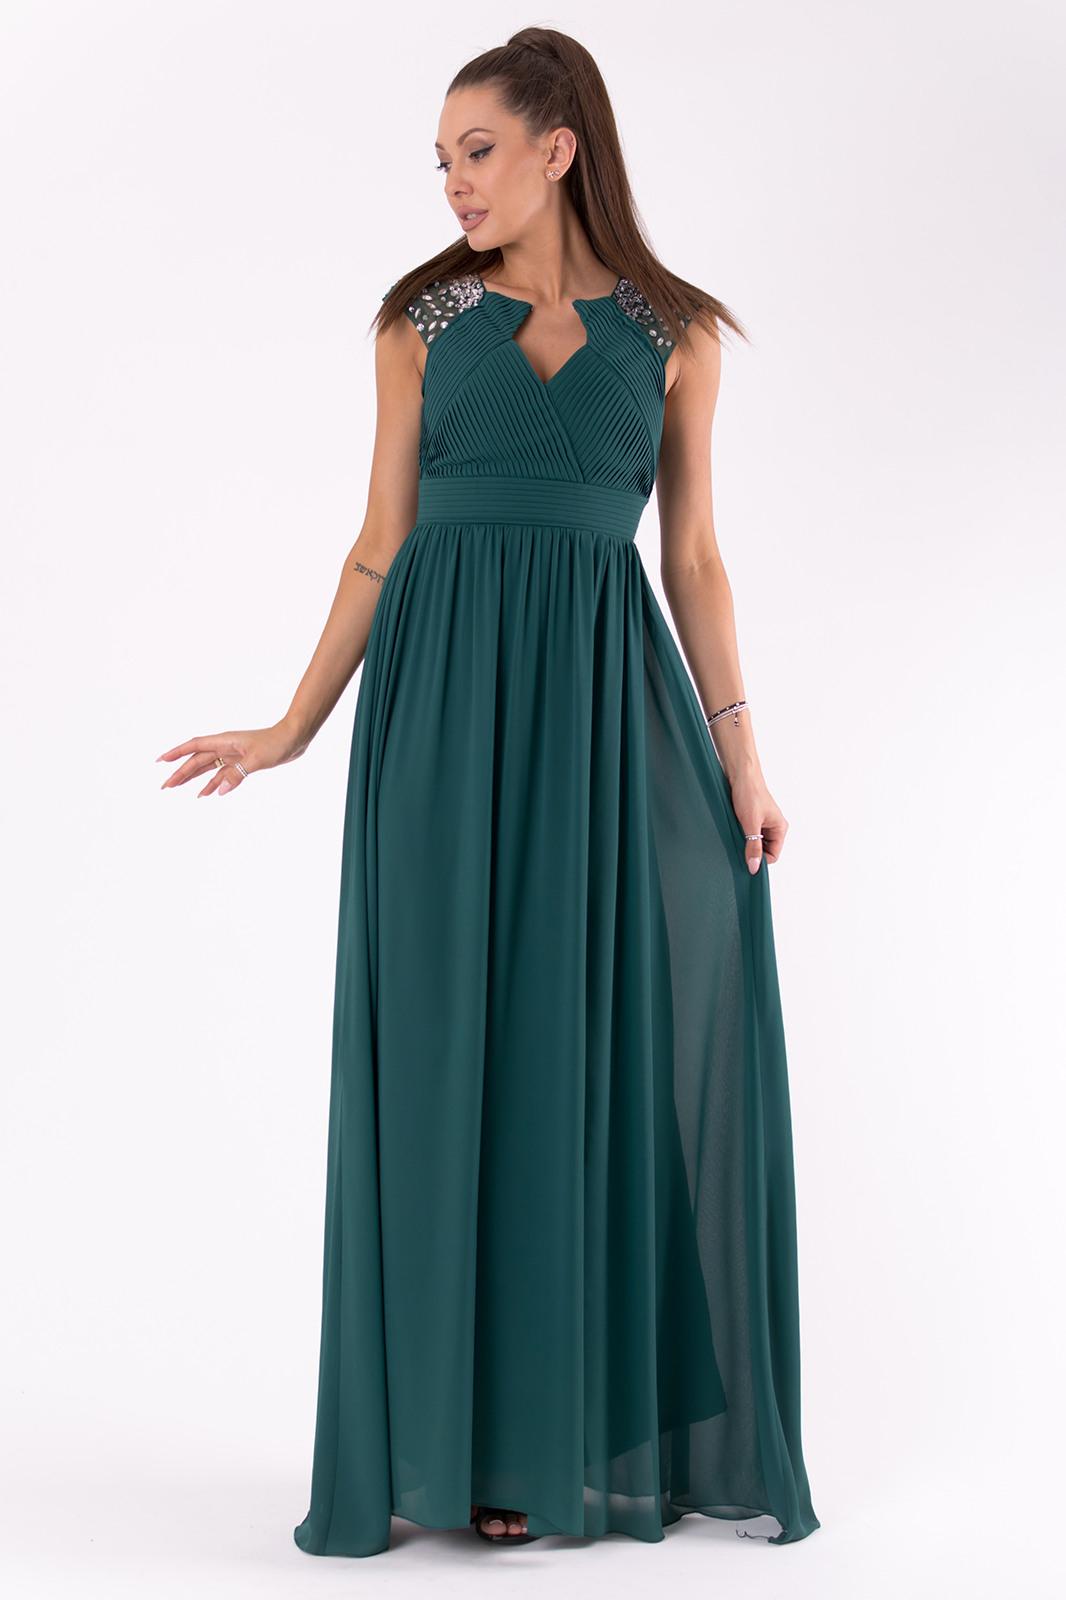 17 Großartig Kleid Grün ÄrmelFormal Schön Kleid Grün Boutique